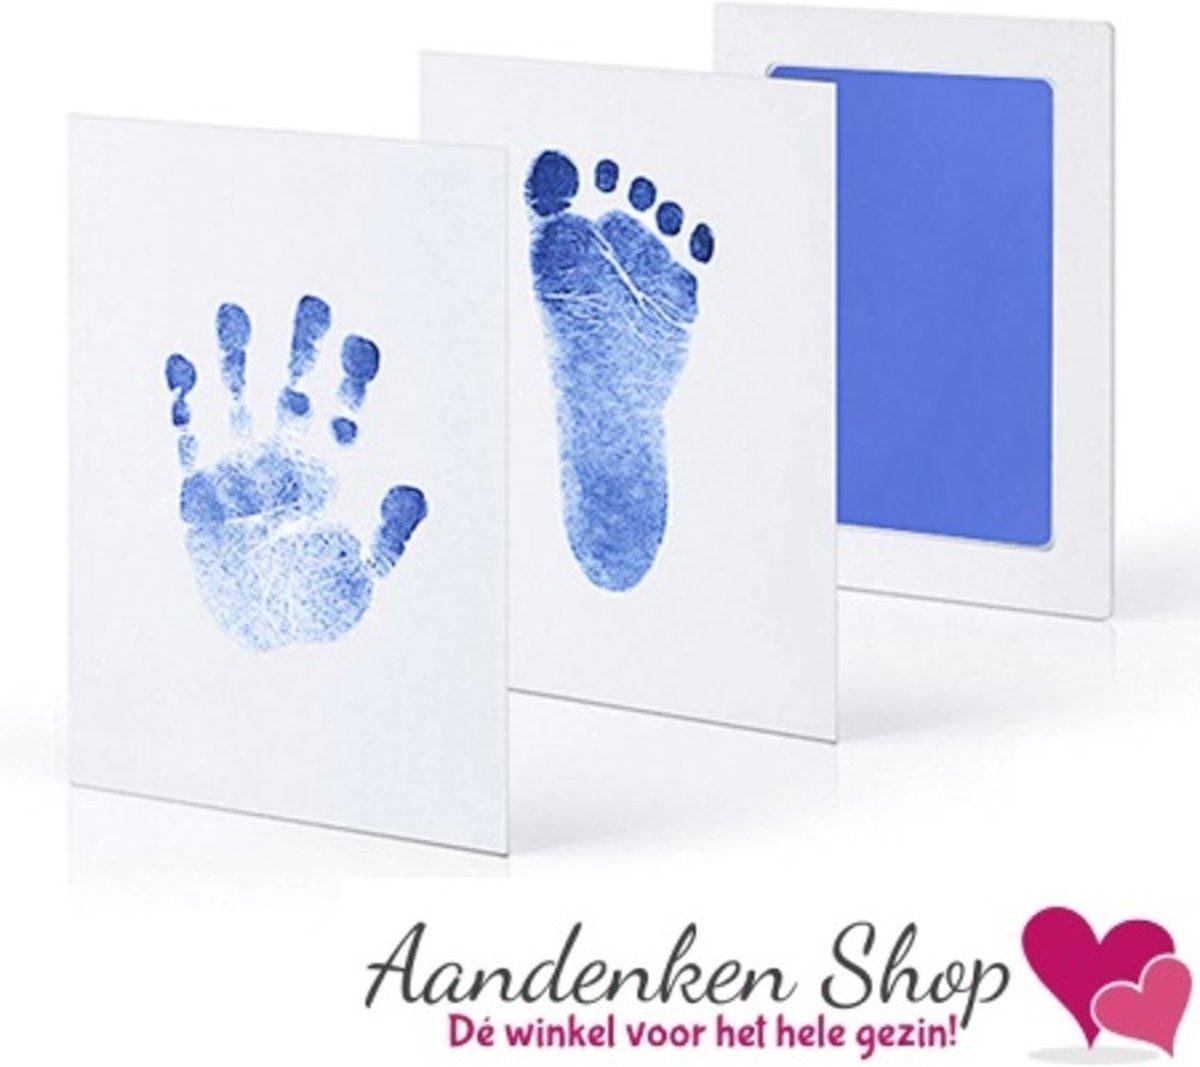 Baby Hand / Voet afdruk Stempel set Blauw - Kraamcadeau - Babyshower